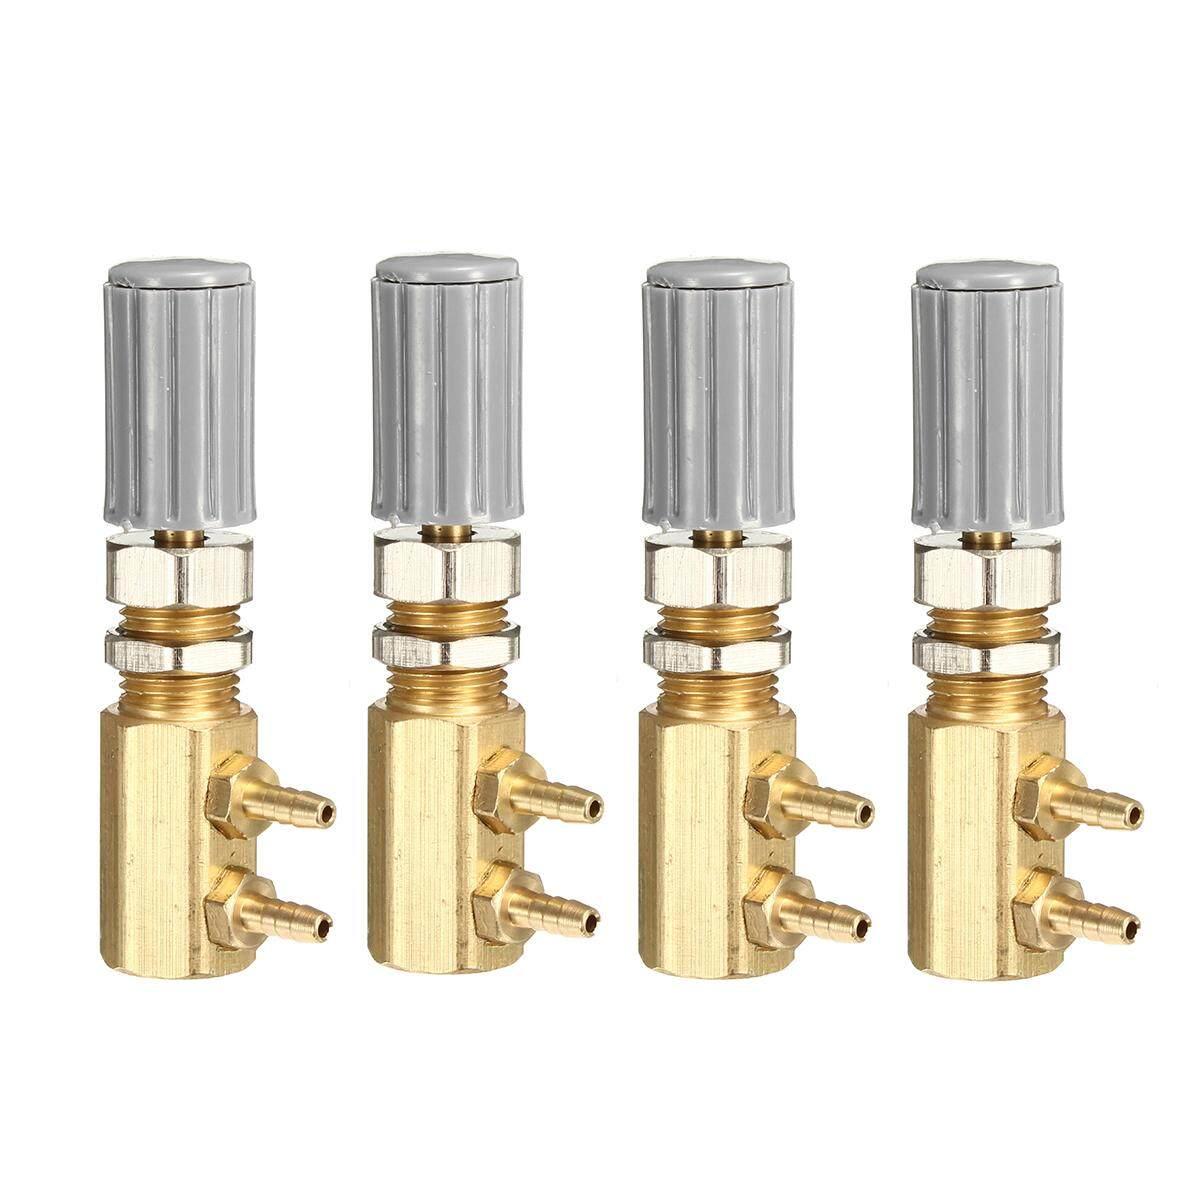 4Pcs 3mm Dental Regulator Control Valve for Dental Chair Turbine Unit Replacement